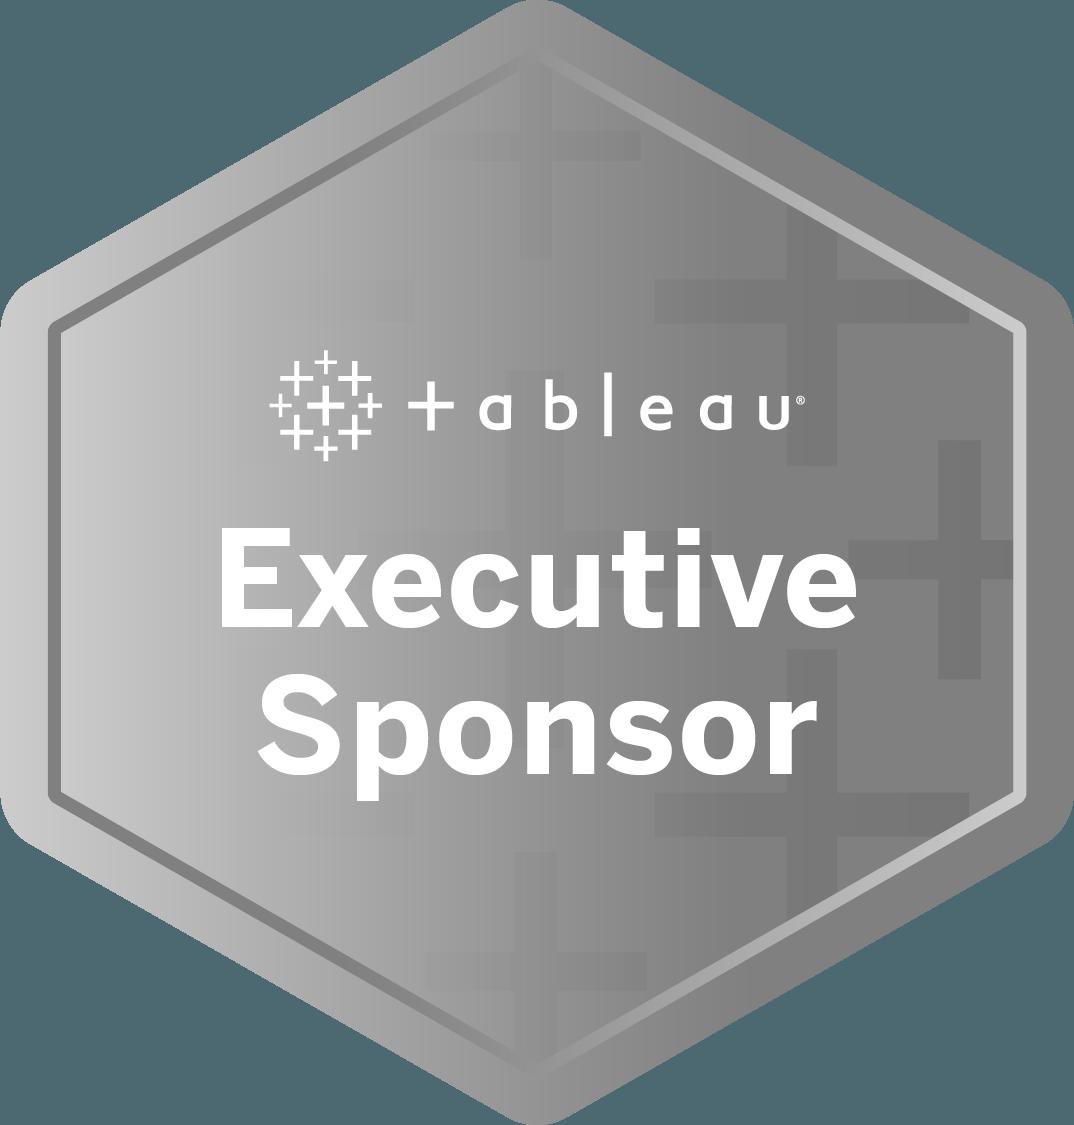 Executive Sponsor badge